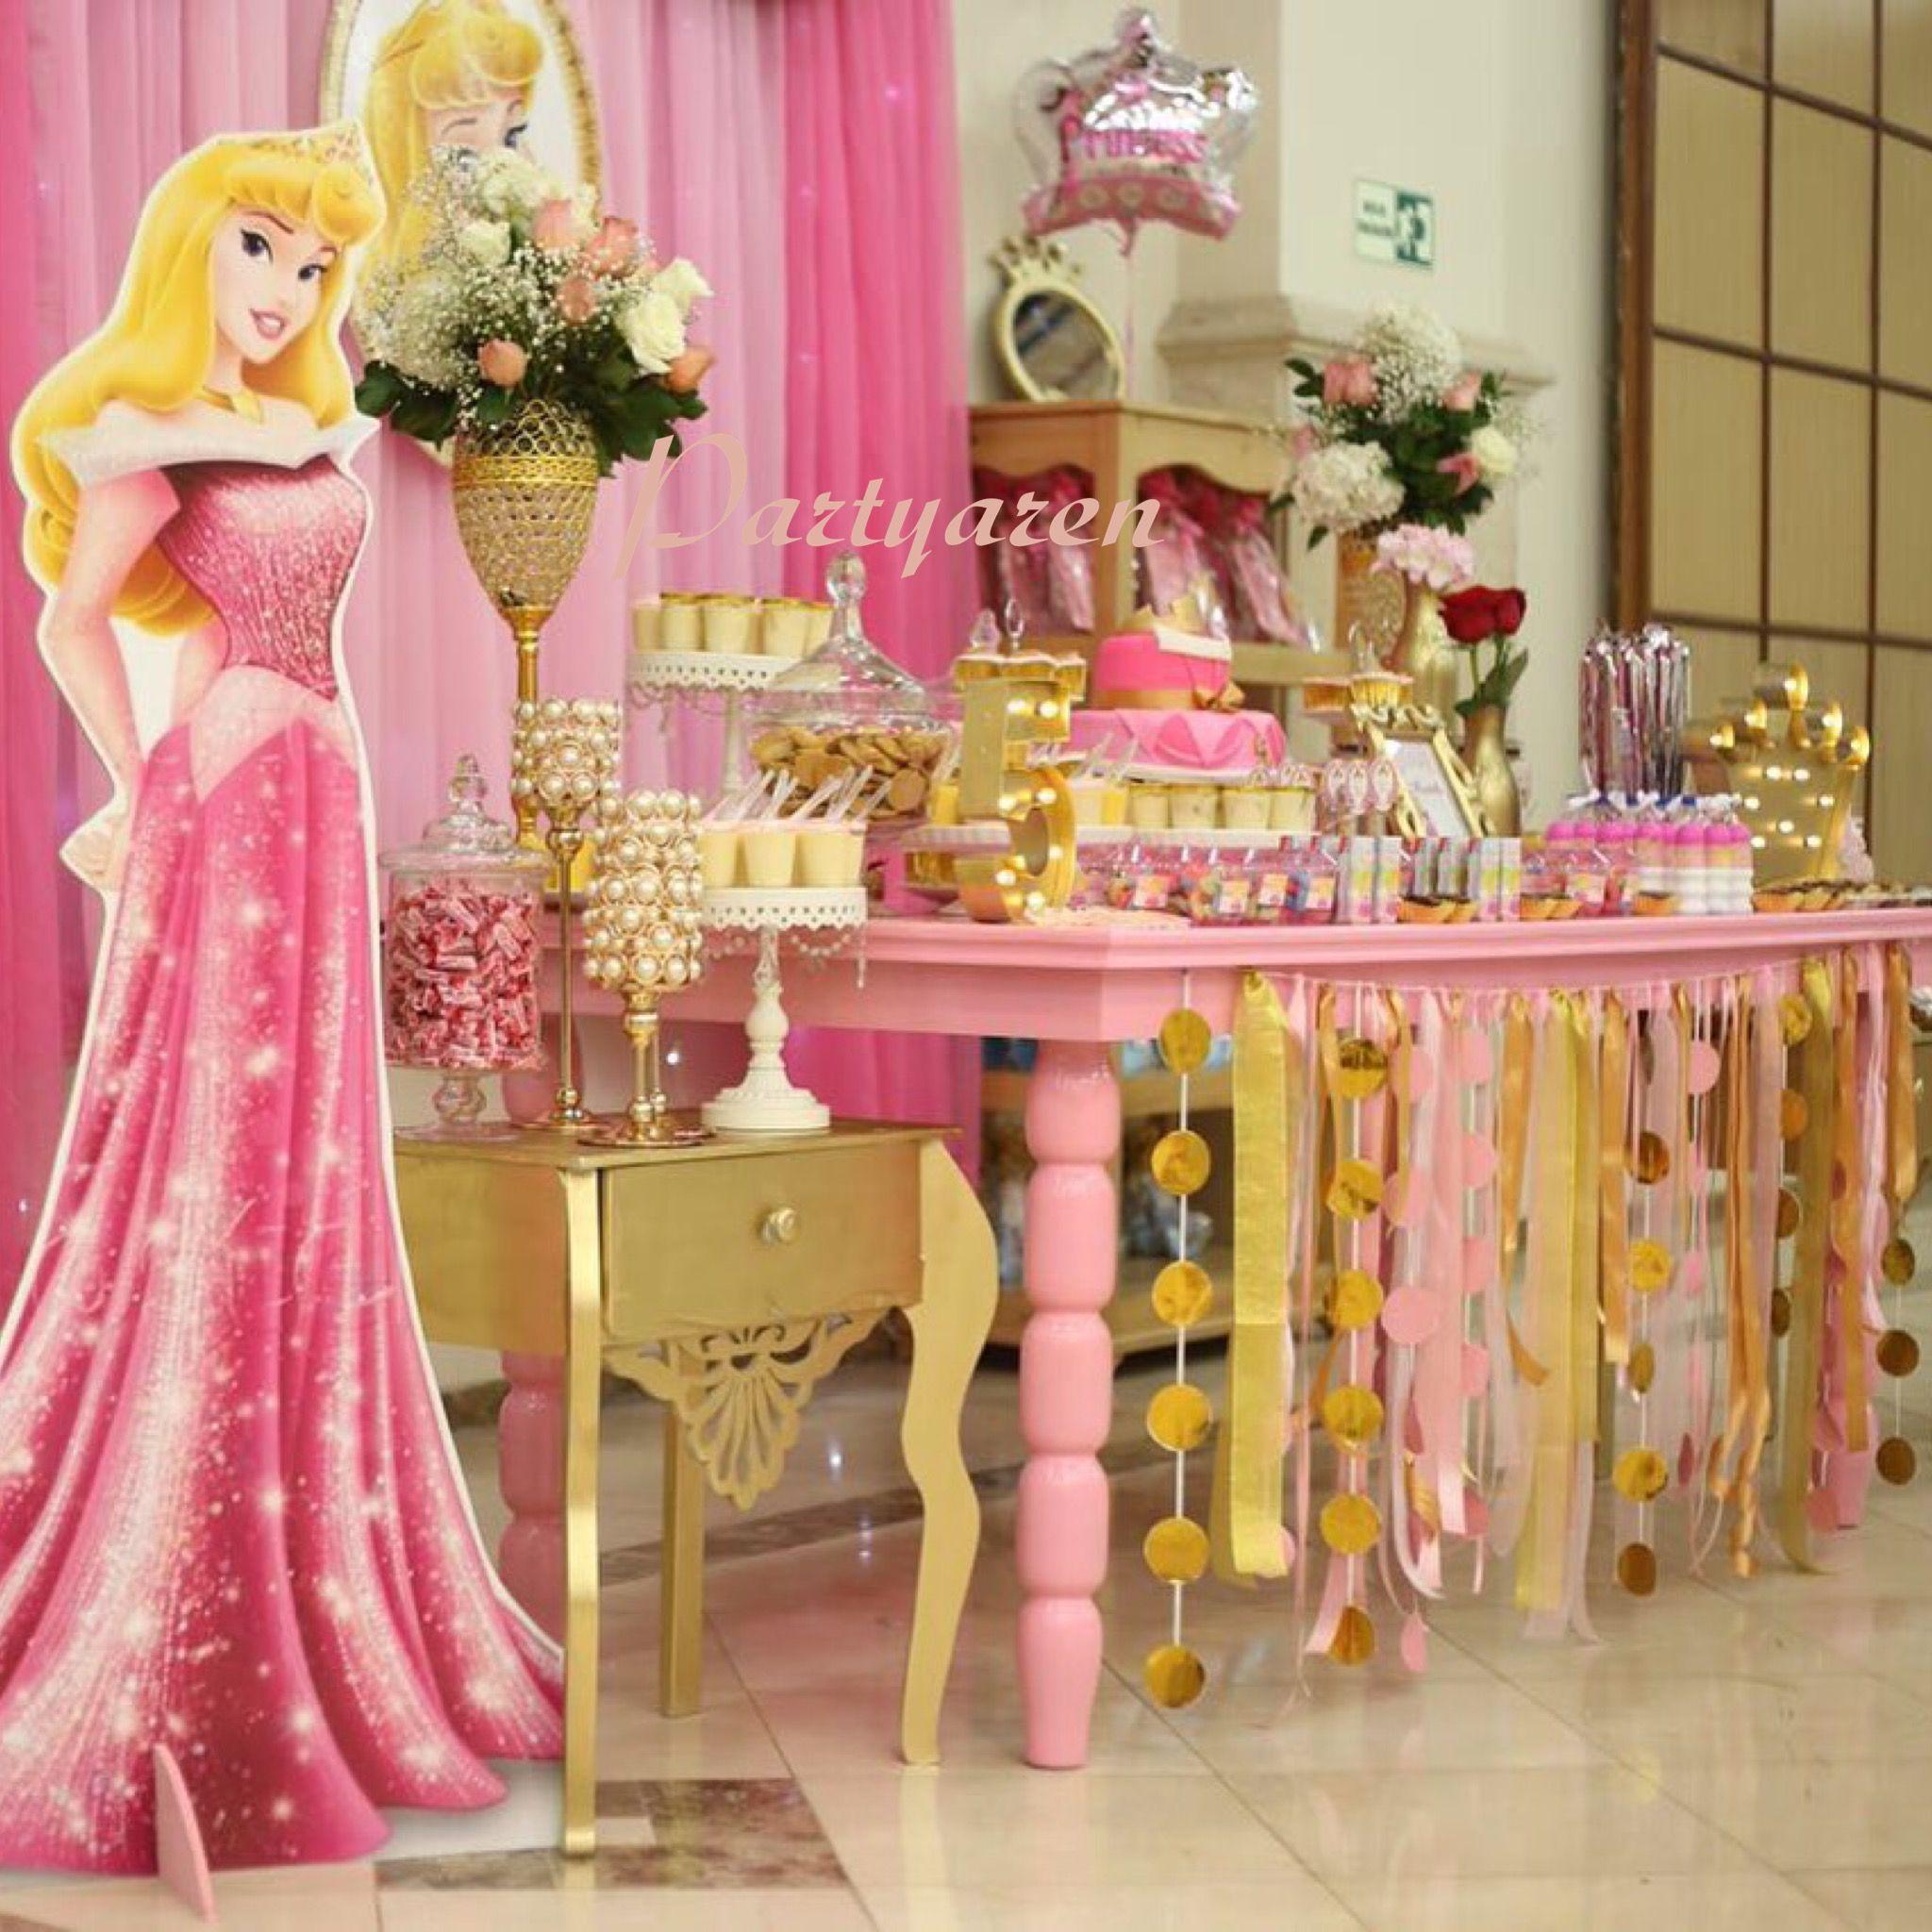 Princesa aurora fiesta princesa princess party fiestas - Ideas para fiestas ...